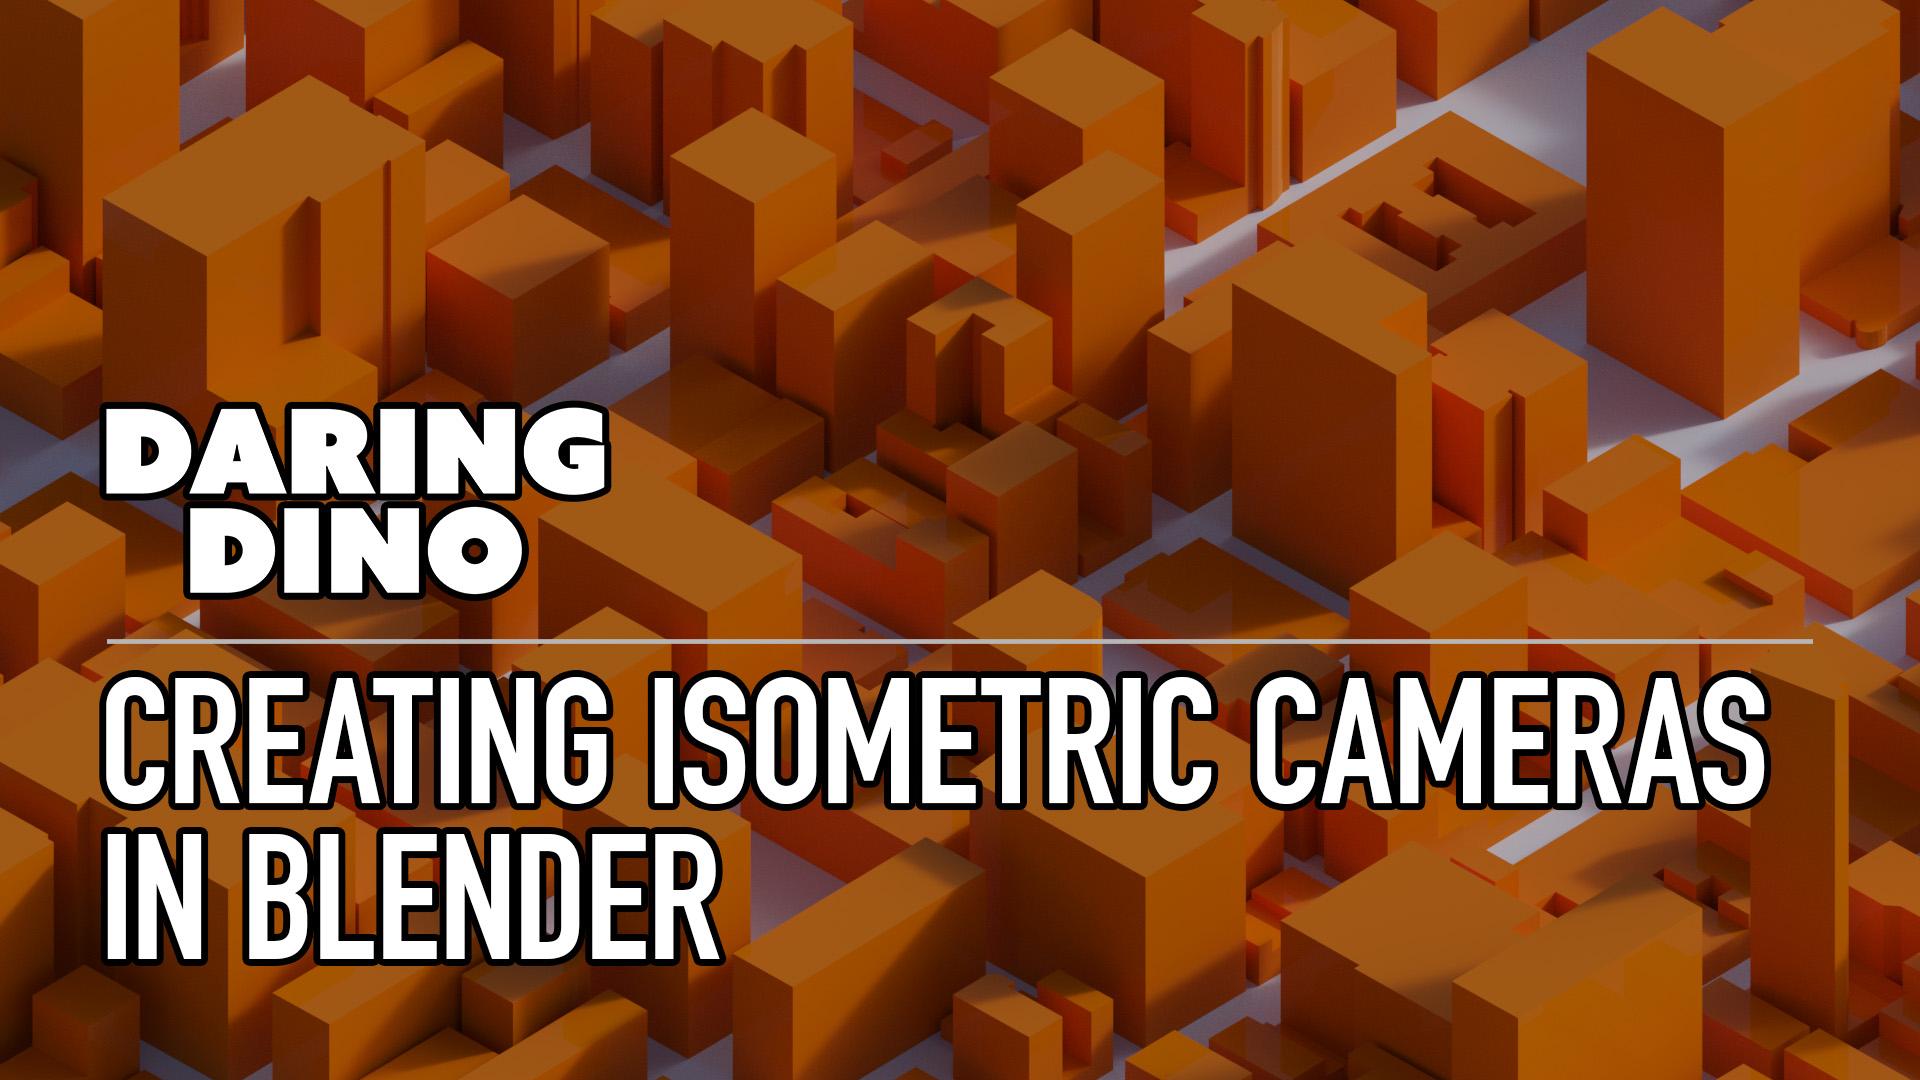 Creating Isometric Cameras in Blender